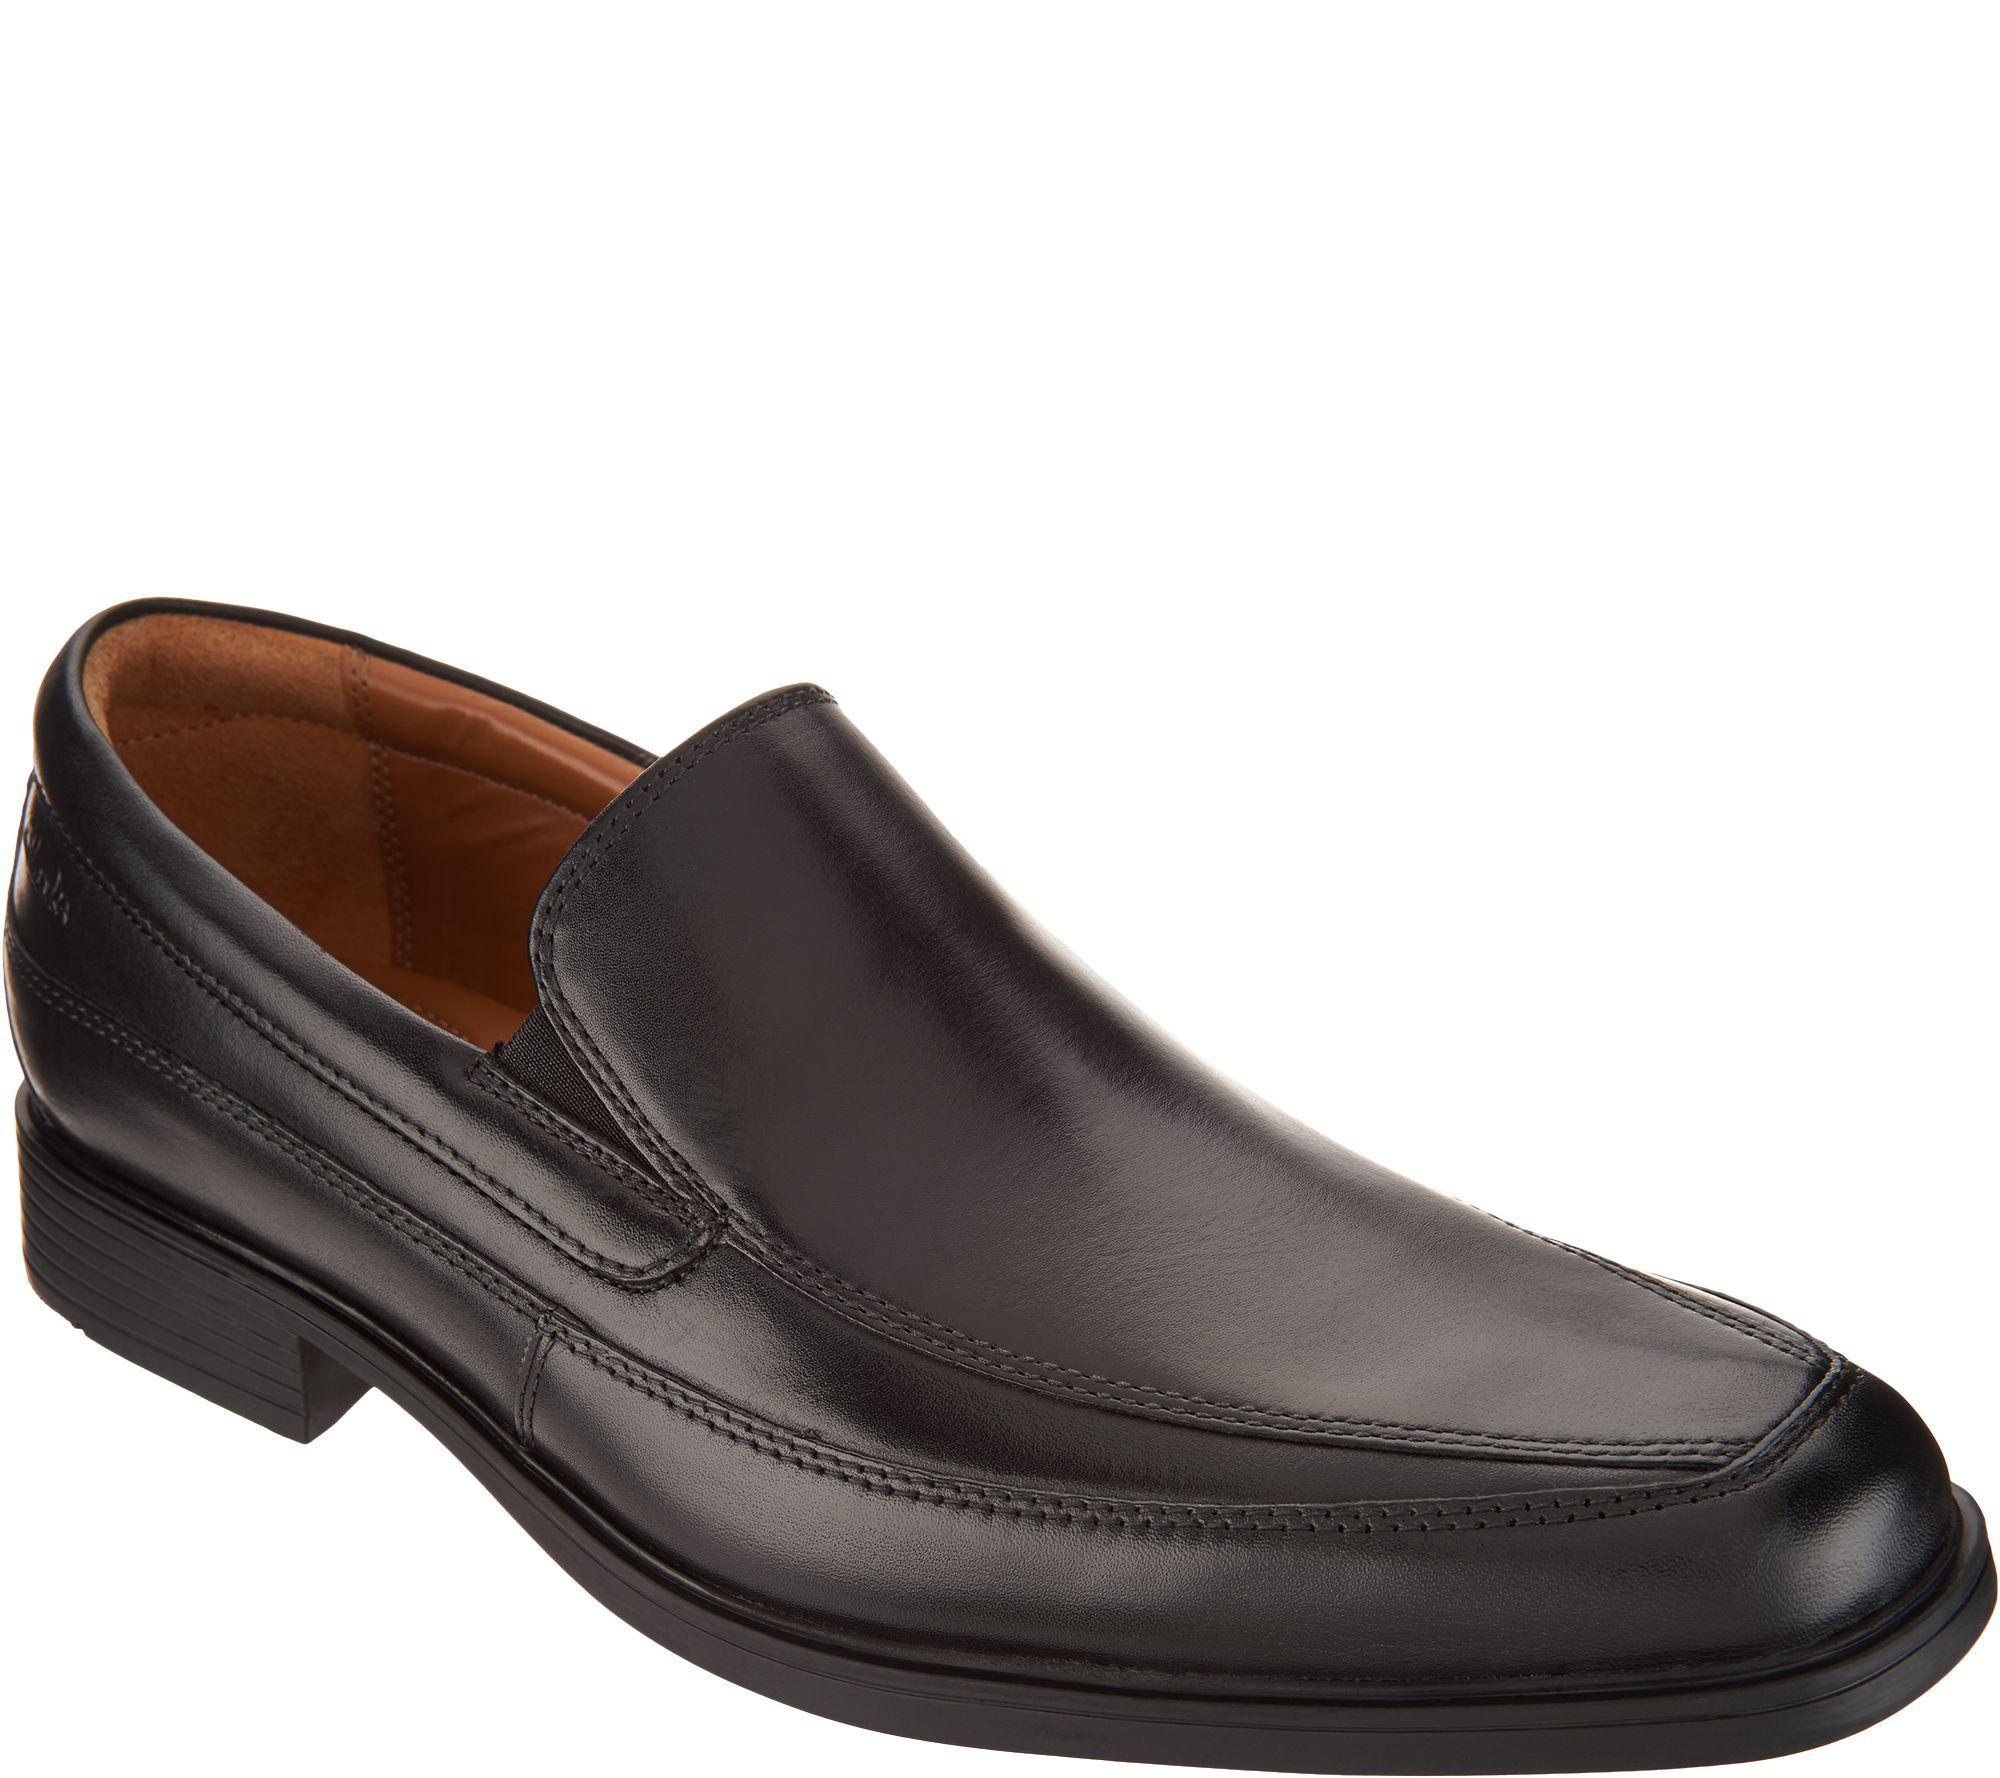 Clarks Men's Leather Loafers - Tilden